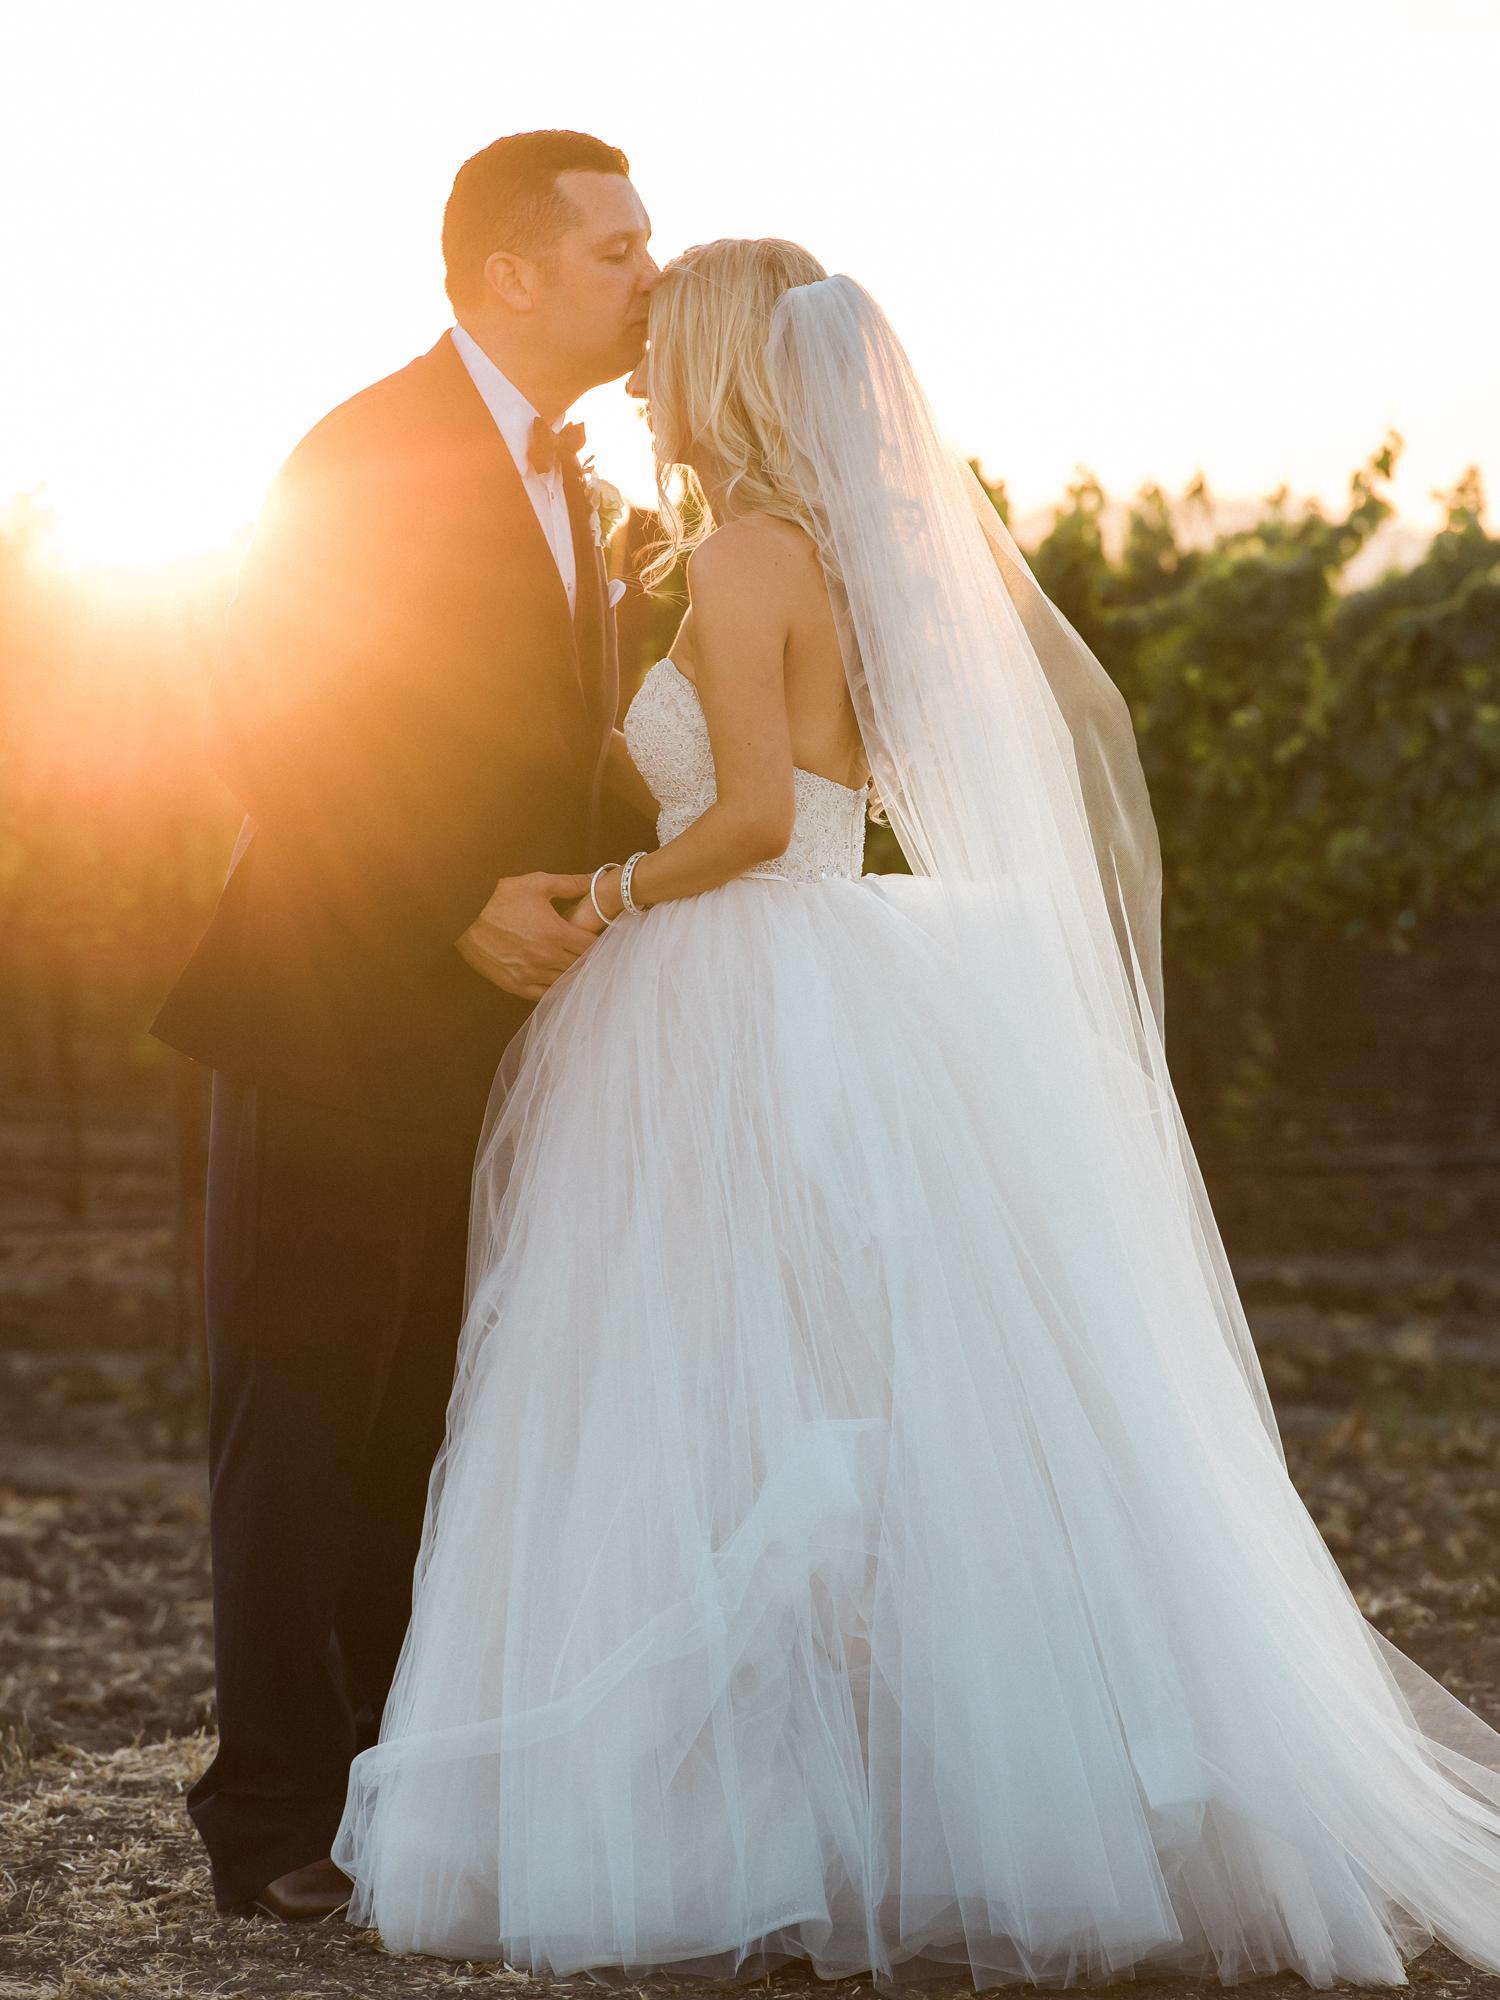 Aimee+Logan_wedding_spp-123.jpg